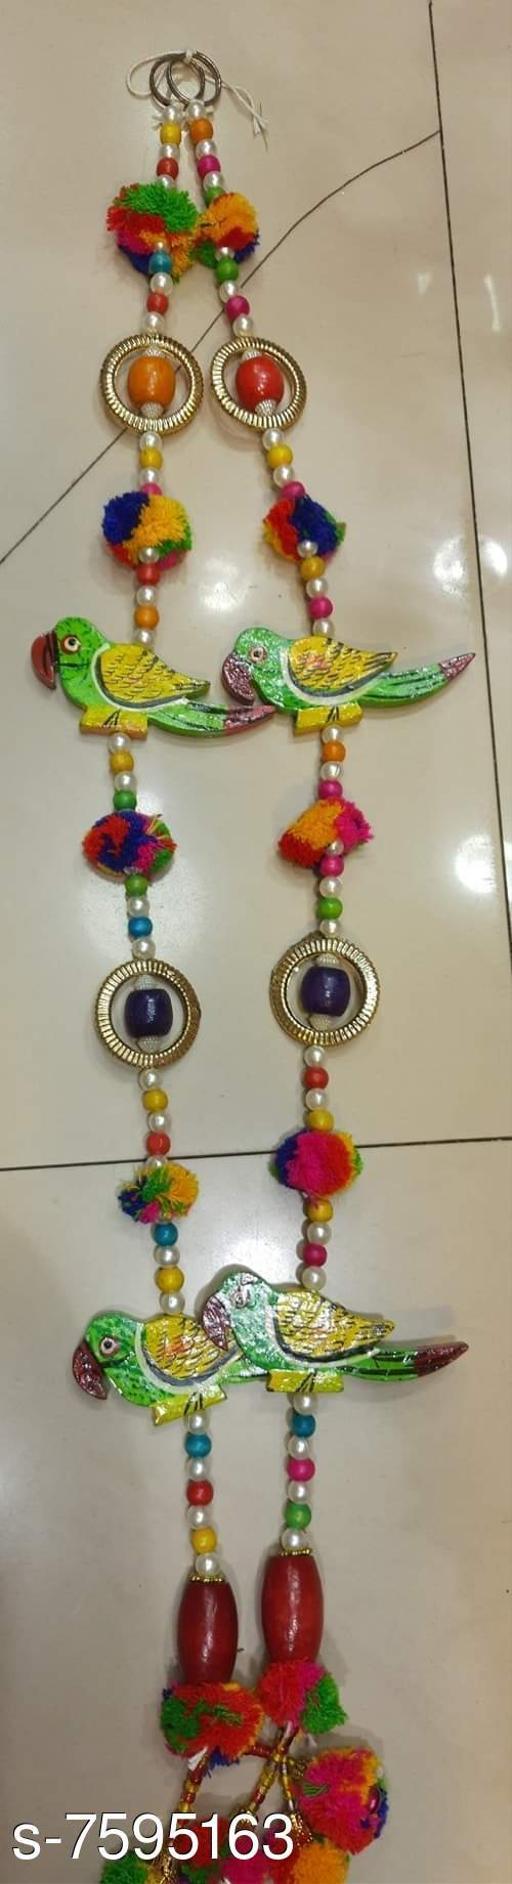 Toran & Wall Hangings TORAN AND HANGINGS  *Material* Handicraft  *Pack* Pack of 2  *Sizes Available* Free Size *    Catalog Name: Fancy Festive Toran CatalogID_1229210 C128-SC1318 Code: 113-7595163-